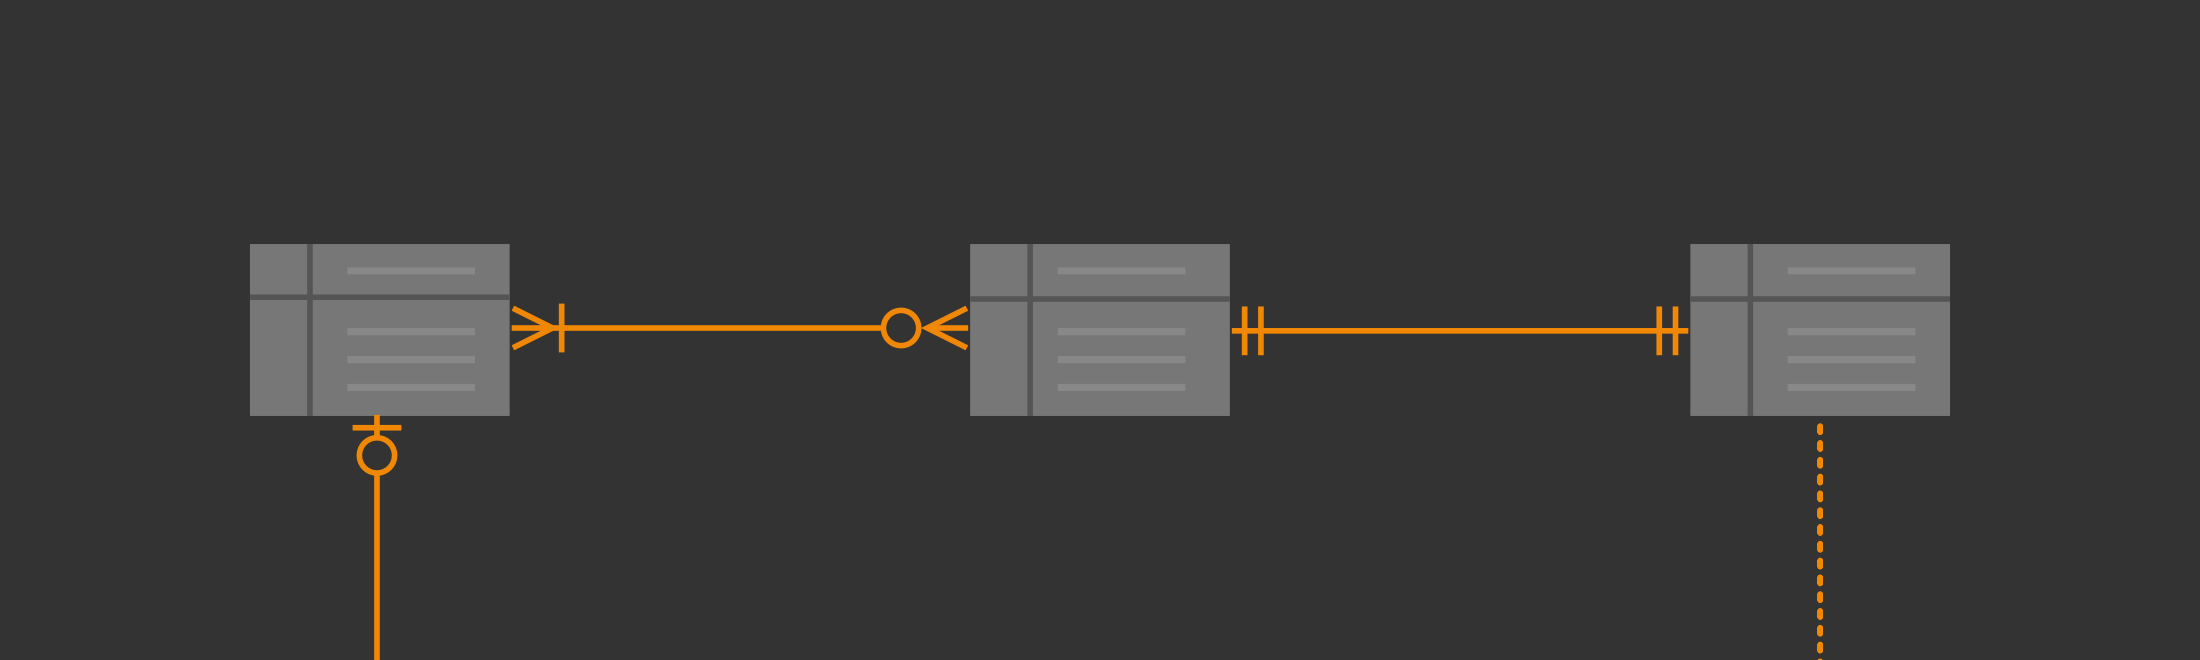 Entity Relationship Diagrams With Draw.io – Draw.io in Er Diagram Connectors